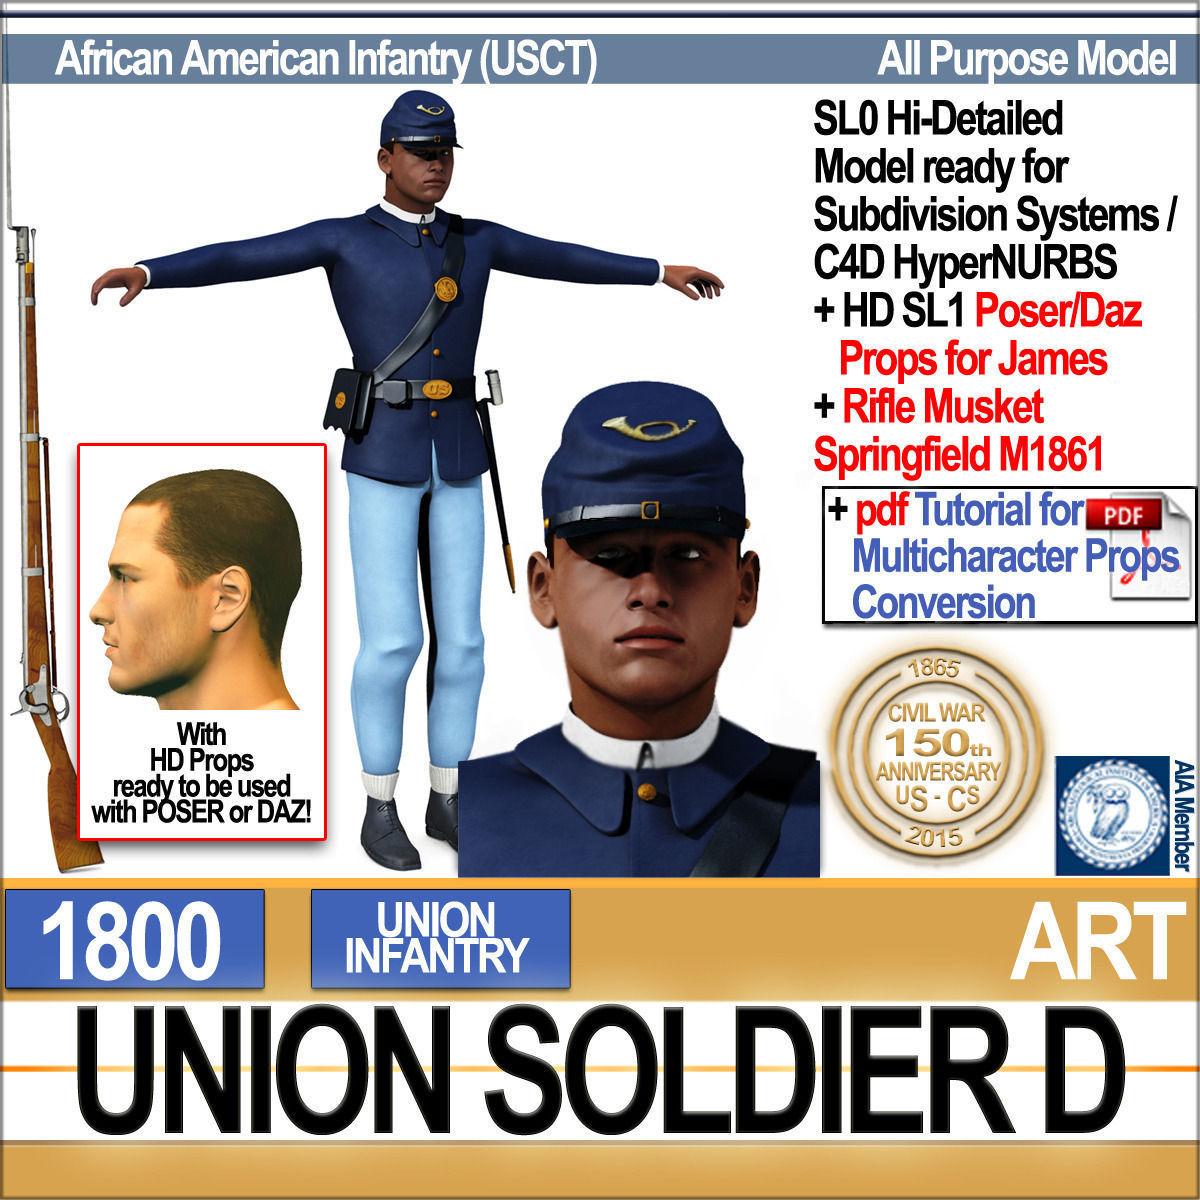 Civil War Union Soldier D African American Infantry wt PoserDaz